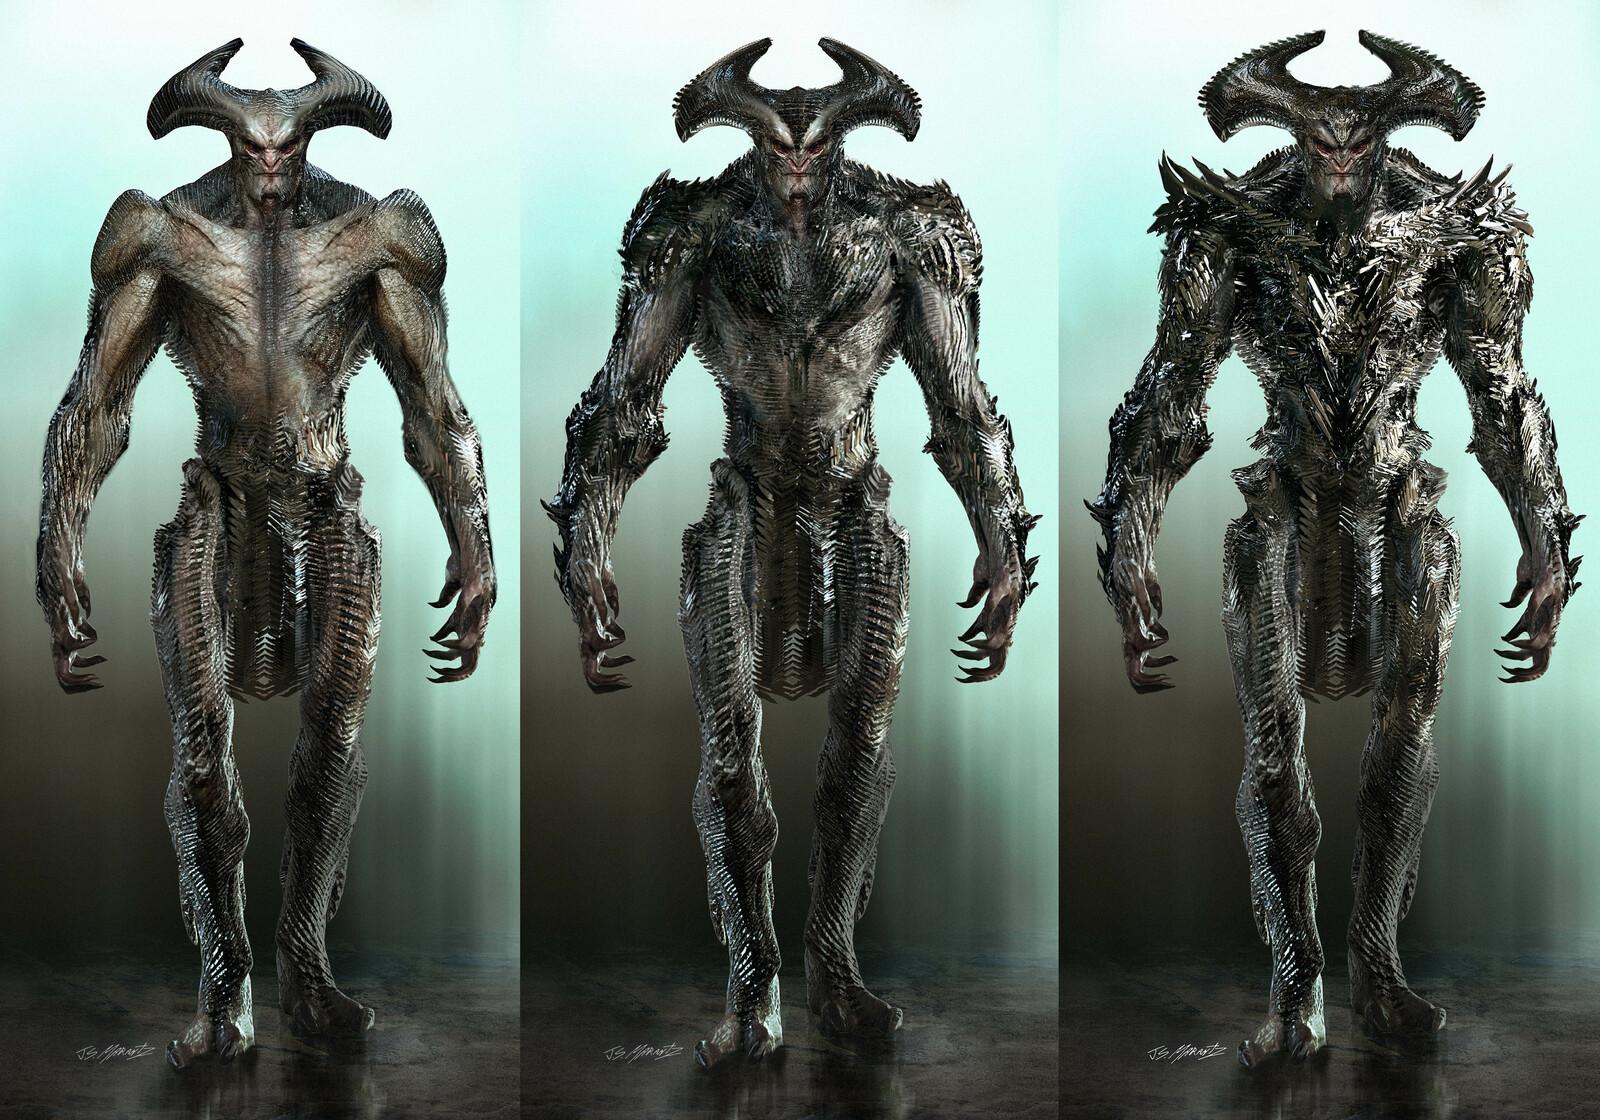 Steppenwolf Concept Art for Batman Vs Superman and Justice League